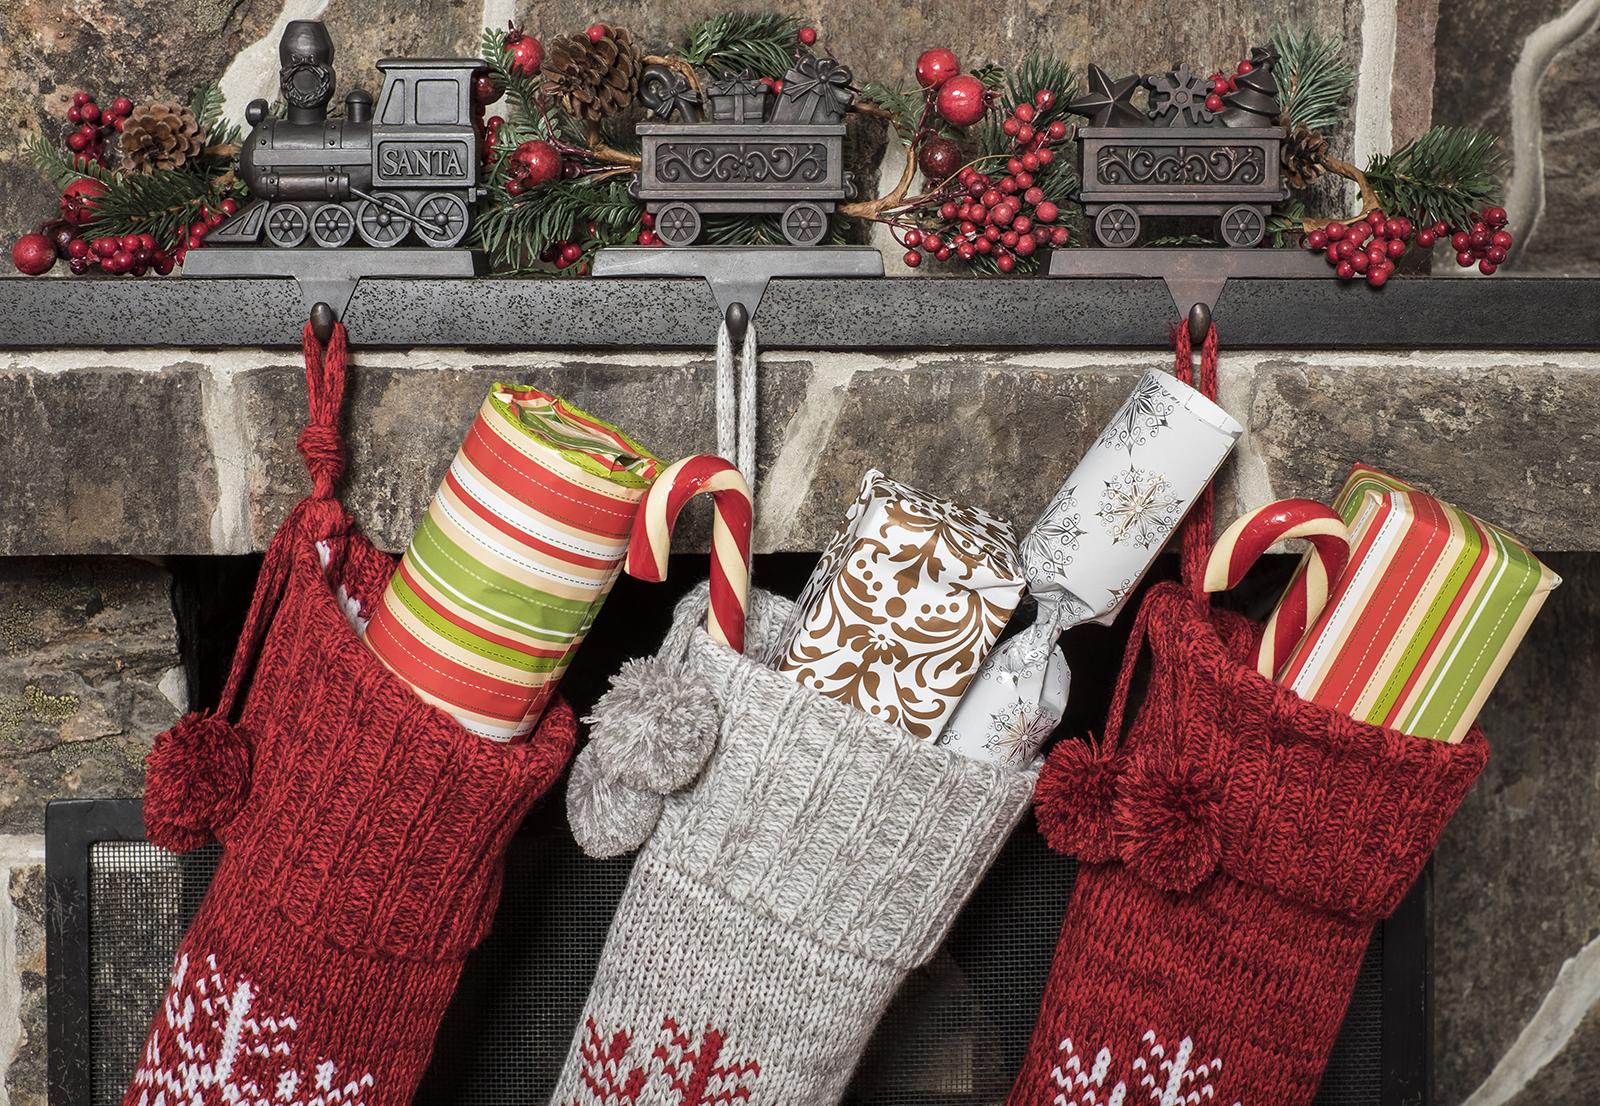 Ask Your Rio Rancho Dentist: Christmas Stocking Filler Ideas